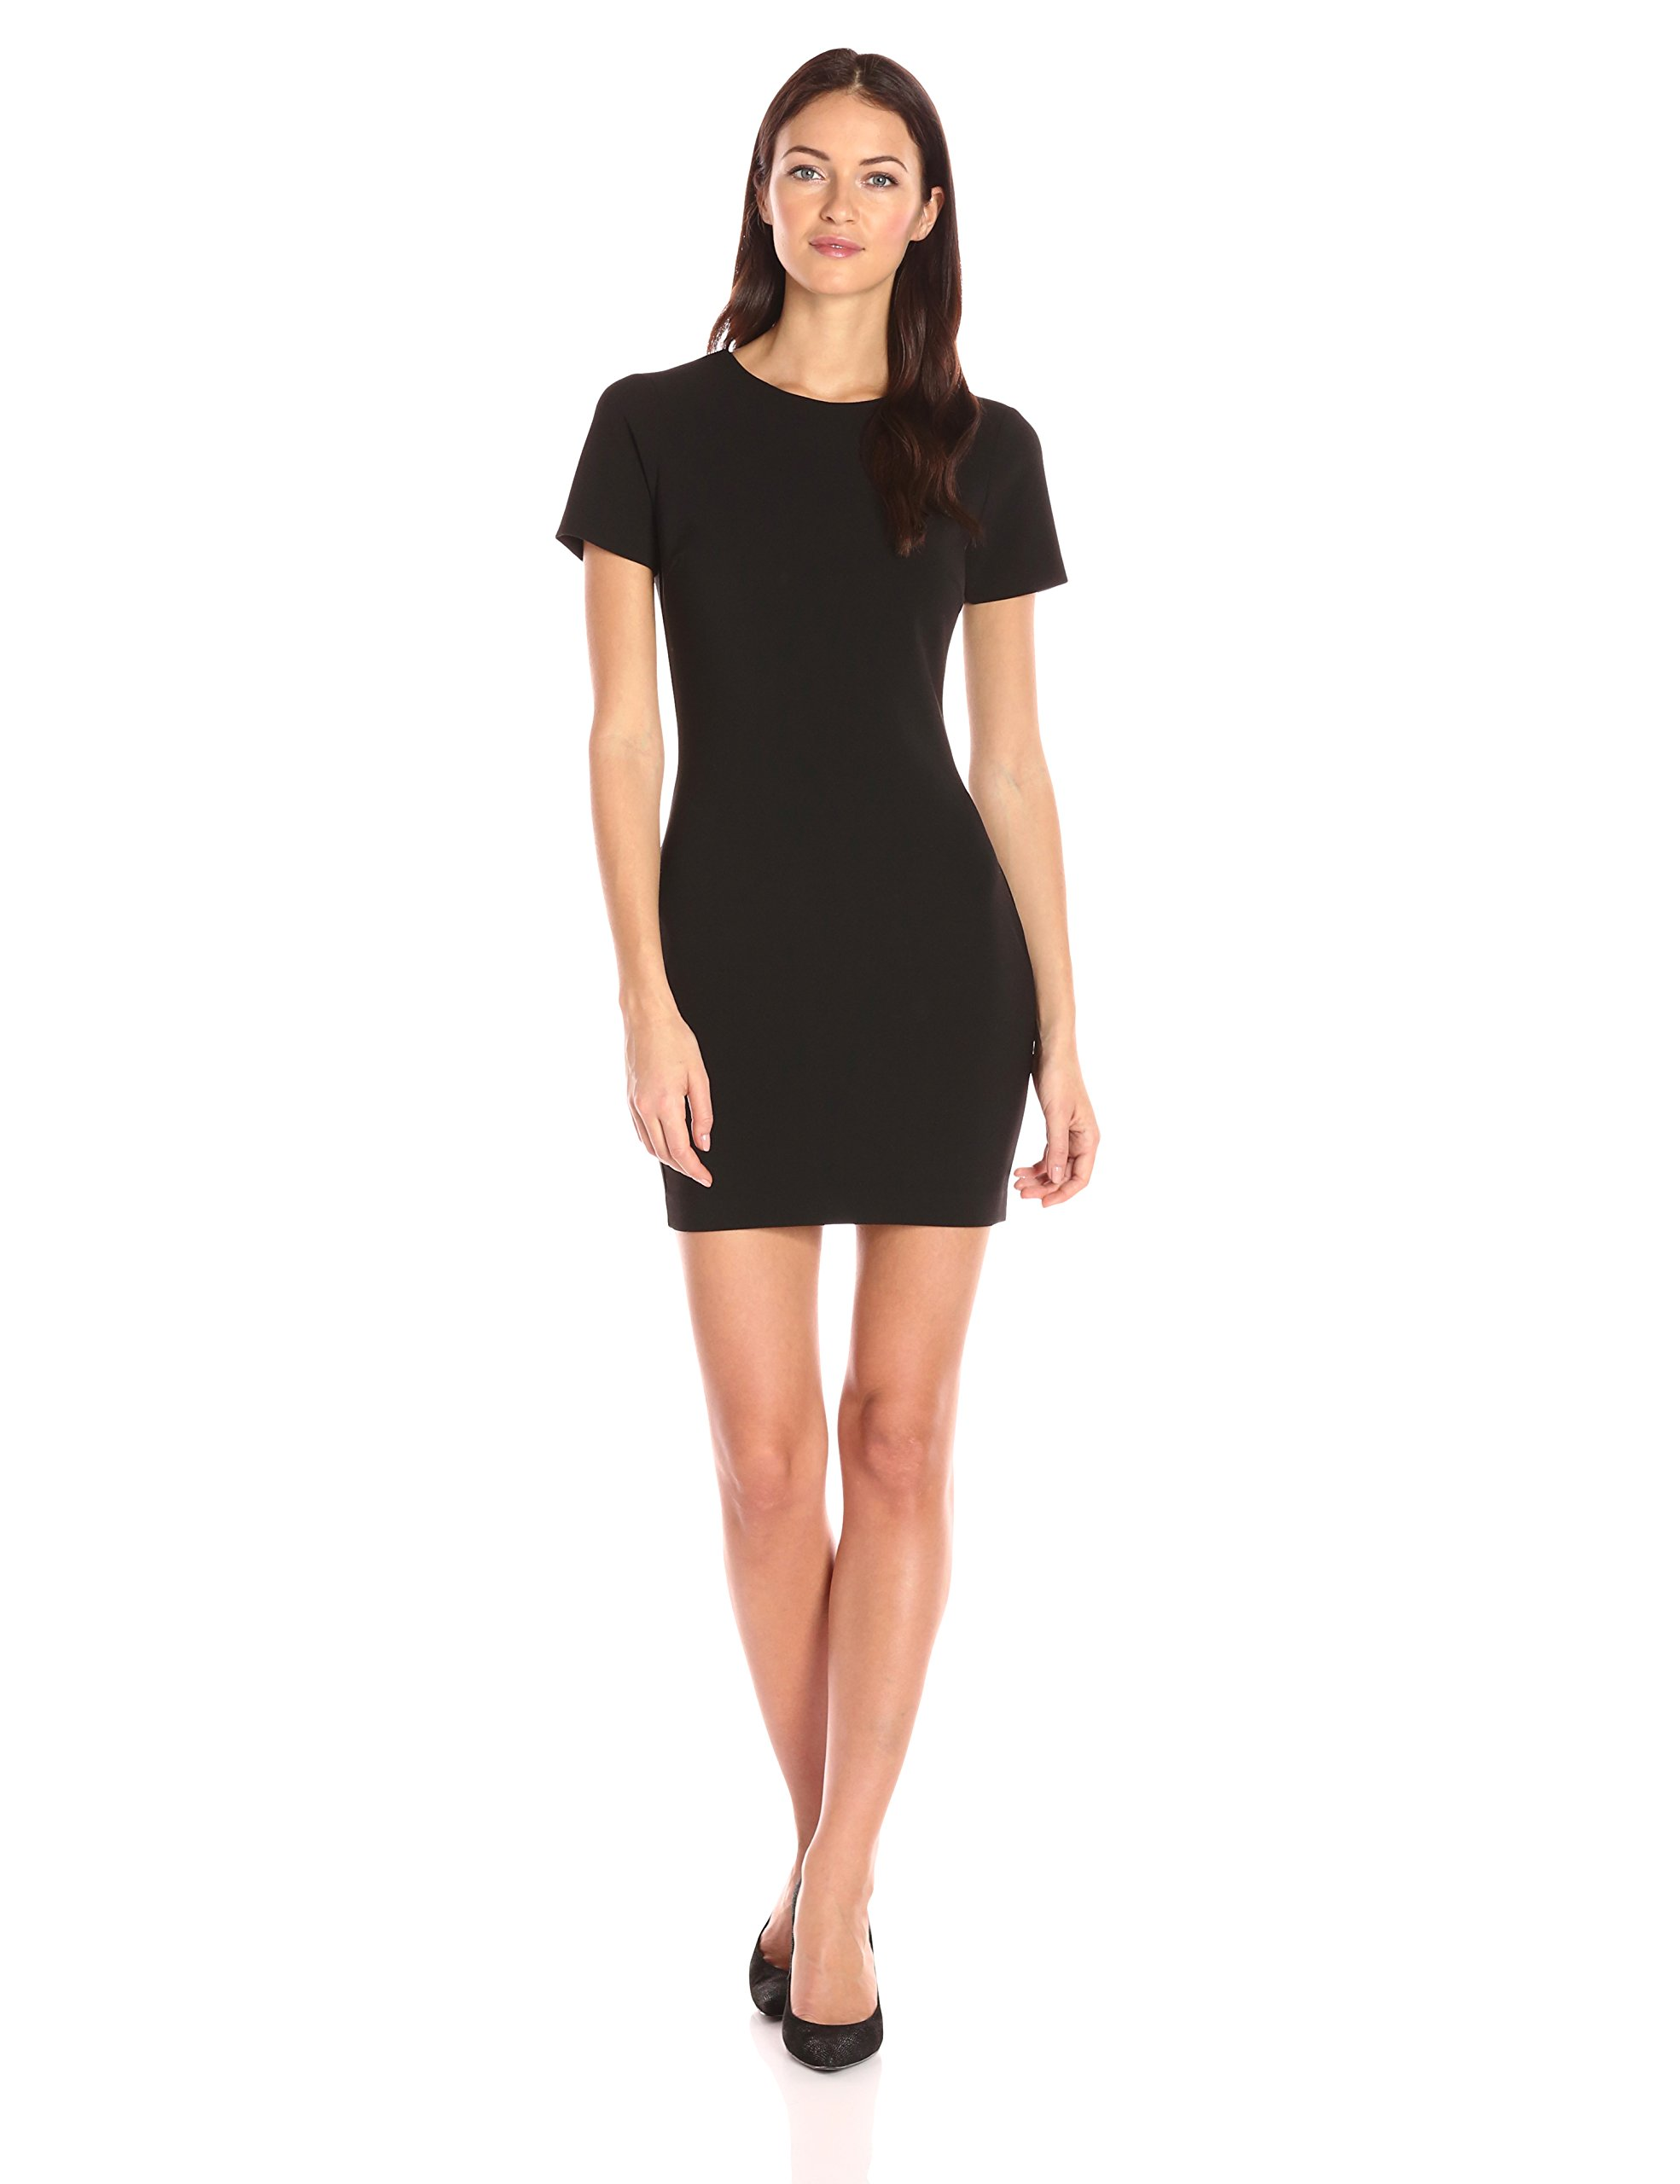 LIKELY Women's Manhattan Dress, Black, 2